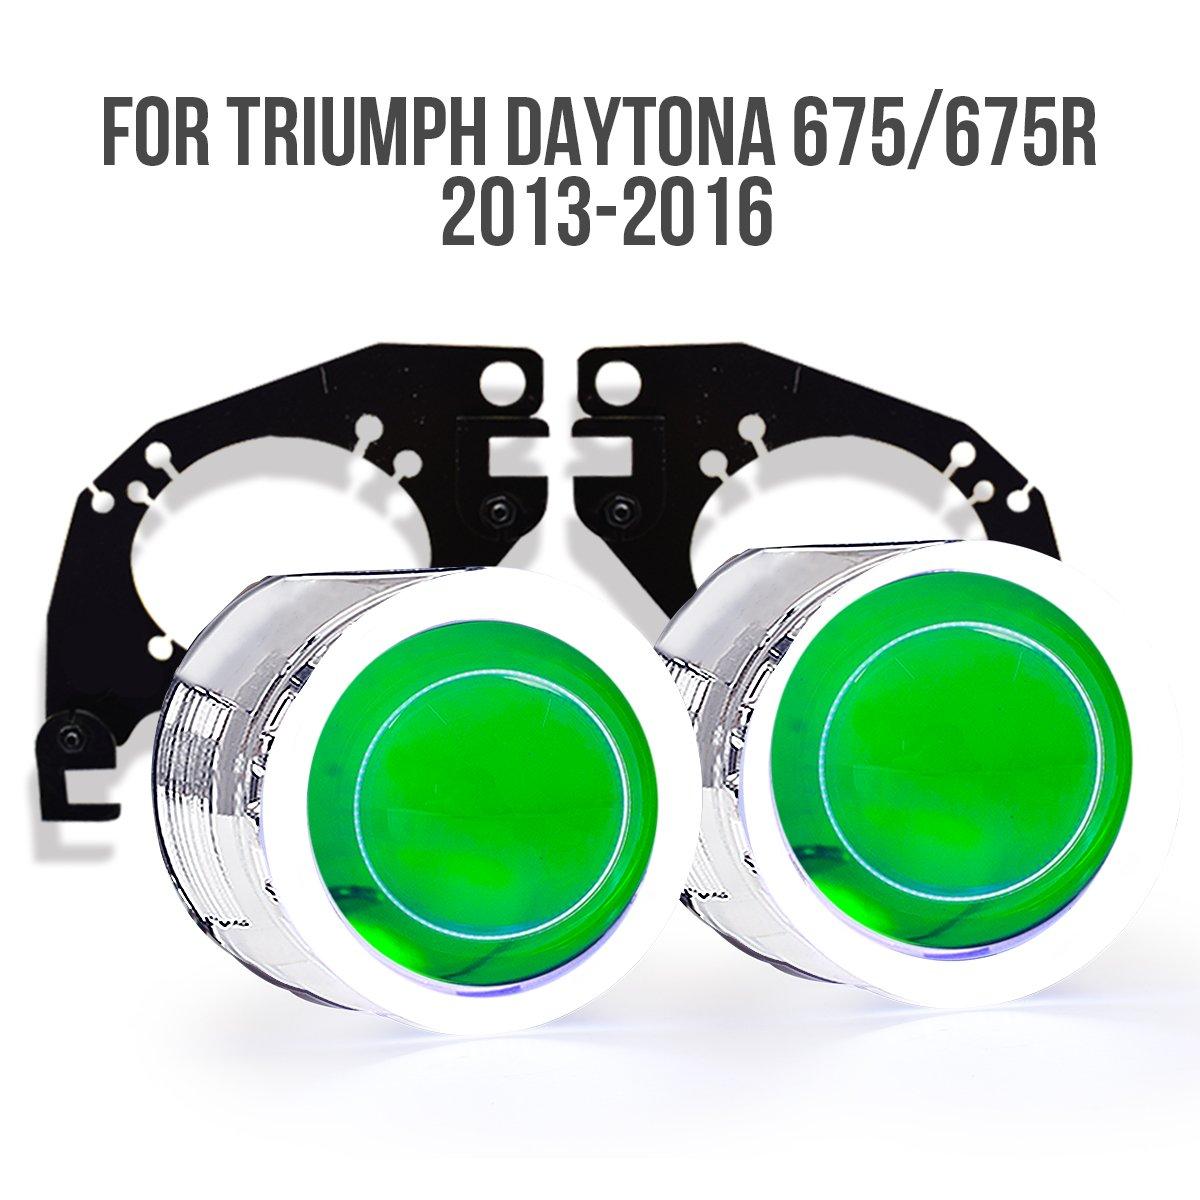 KT Tailor-Made HID Projector Kit HP7 for Triumph Daytona 675/675R 2013-2017 Red Demon Eye Kingtech